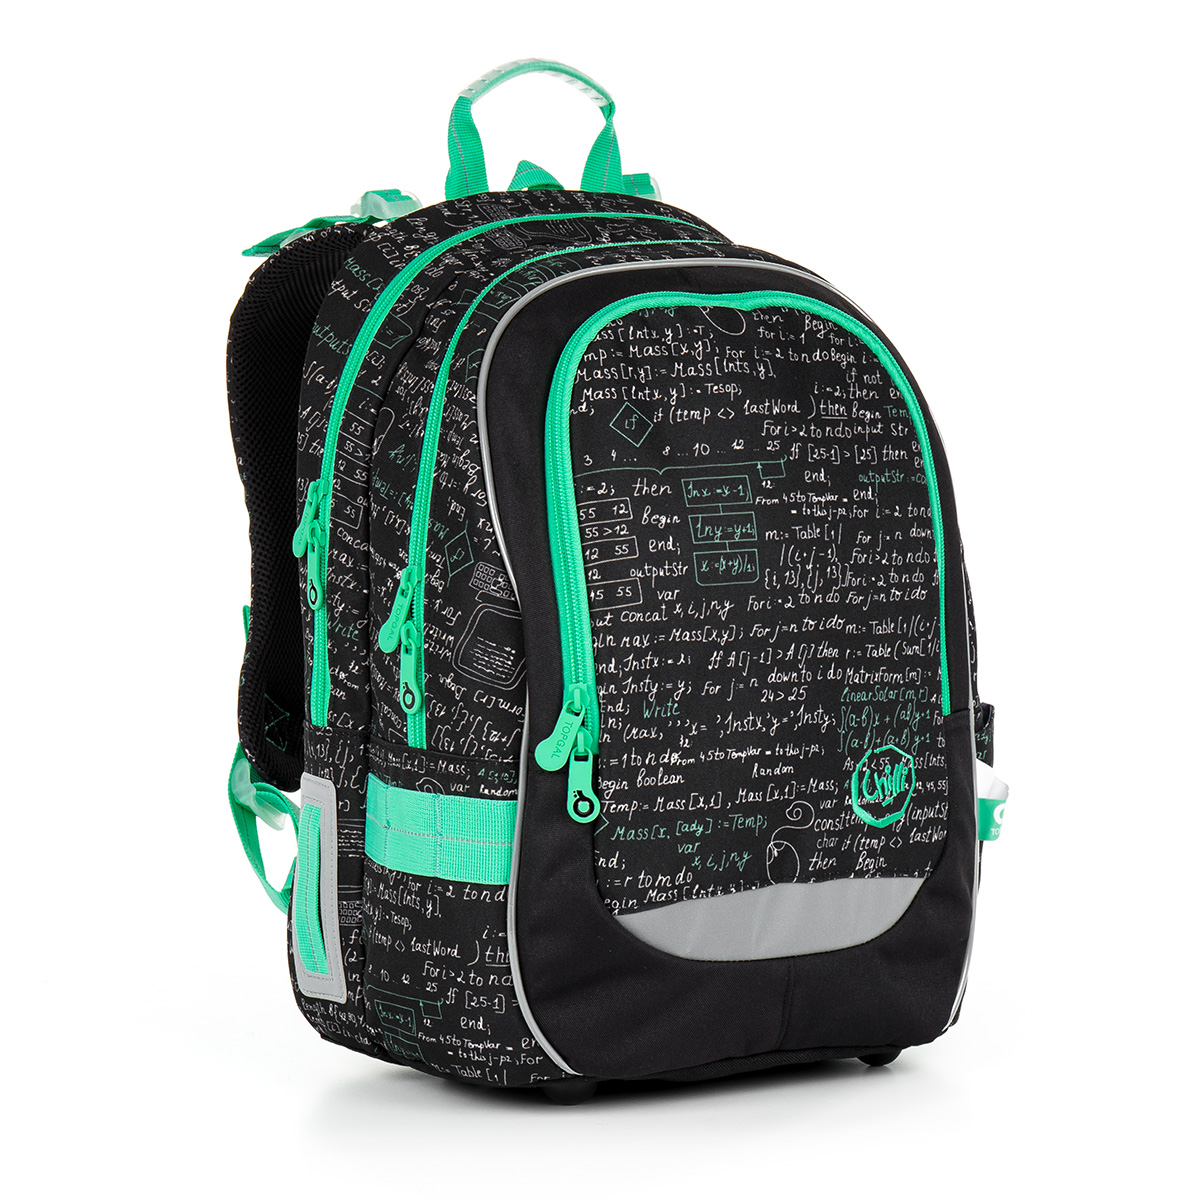 928f08eba48 Školní batoh TOPGAL - CHI 866 A - Black